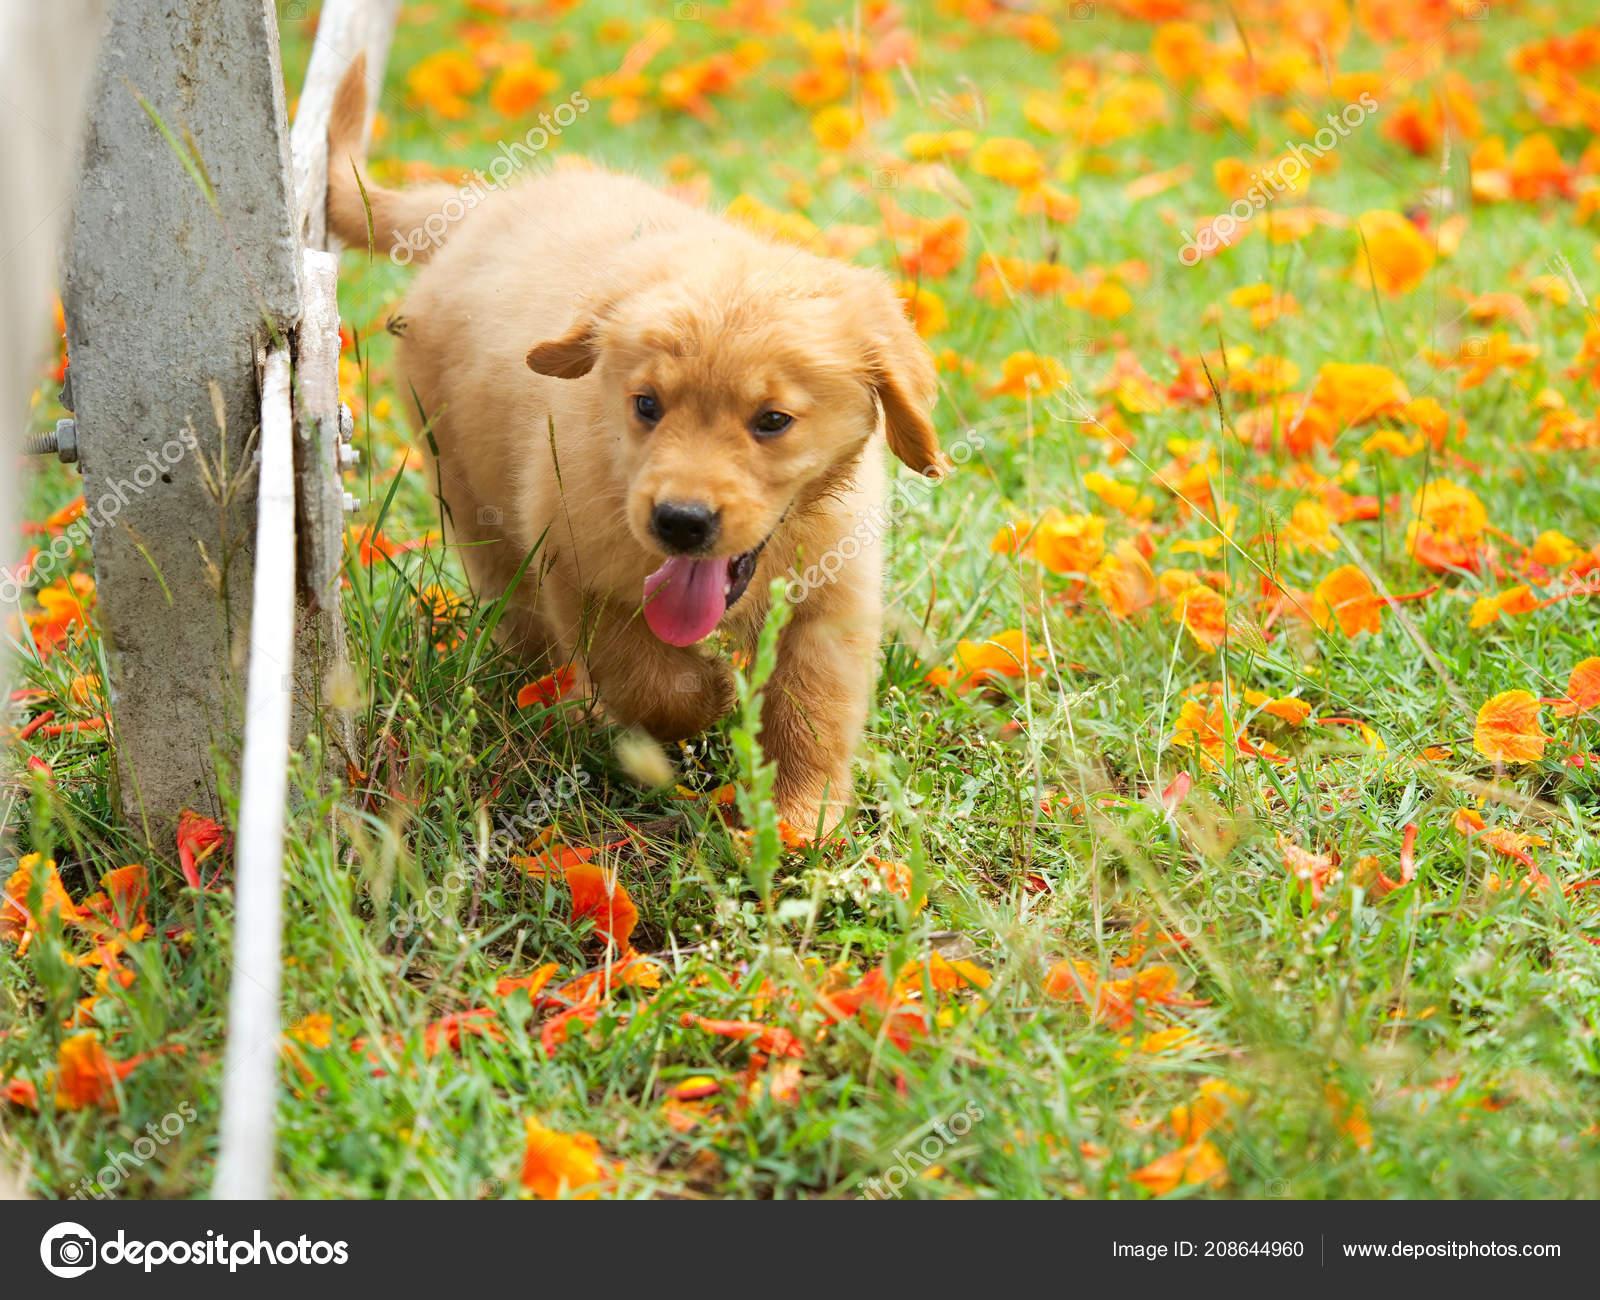 Cute Puppy Golden Retriever Running Park Stock Photo C Chayathon 208644960